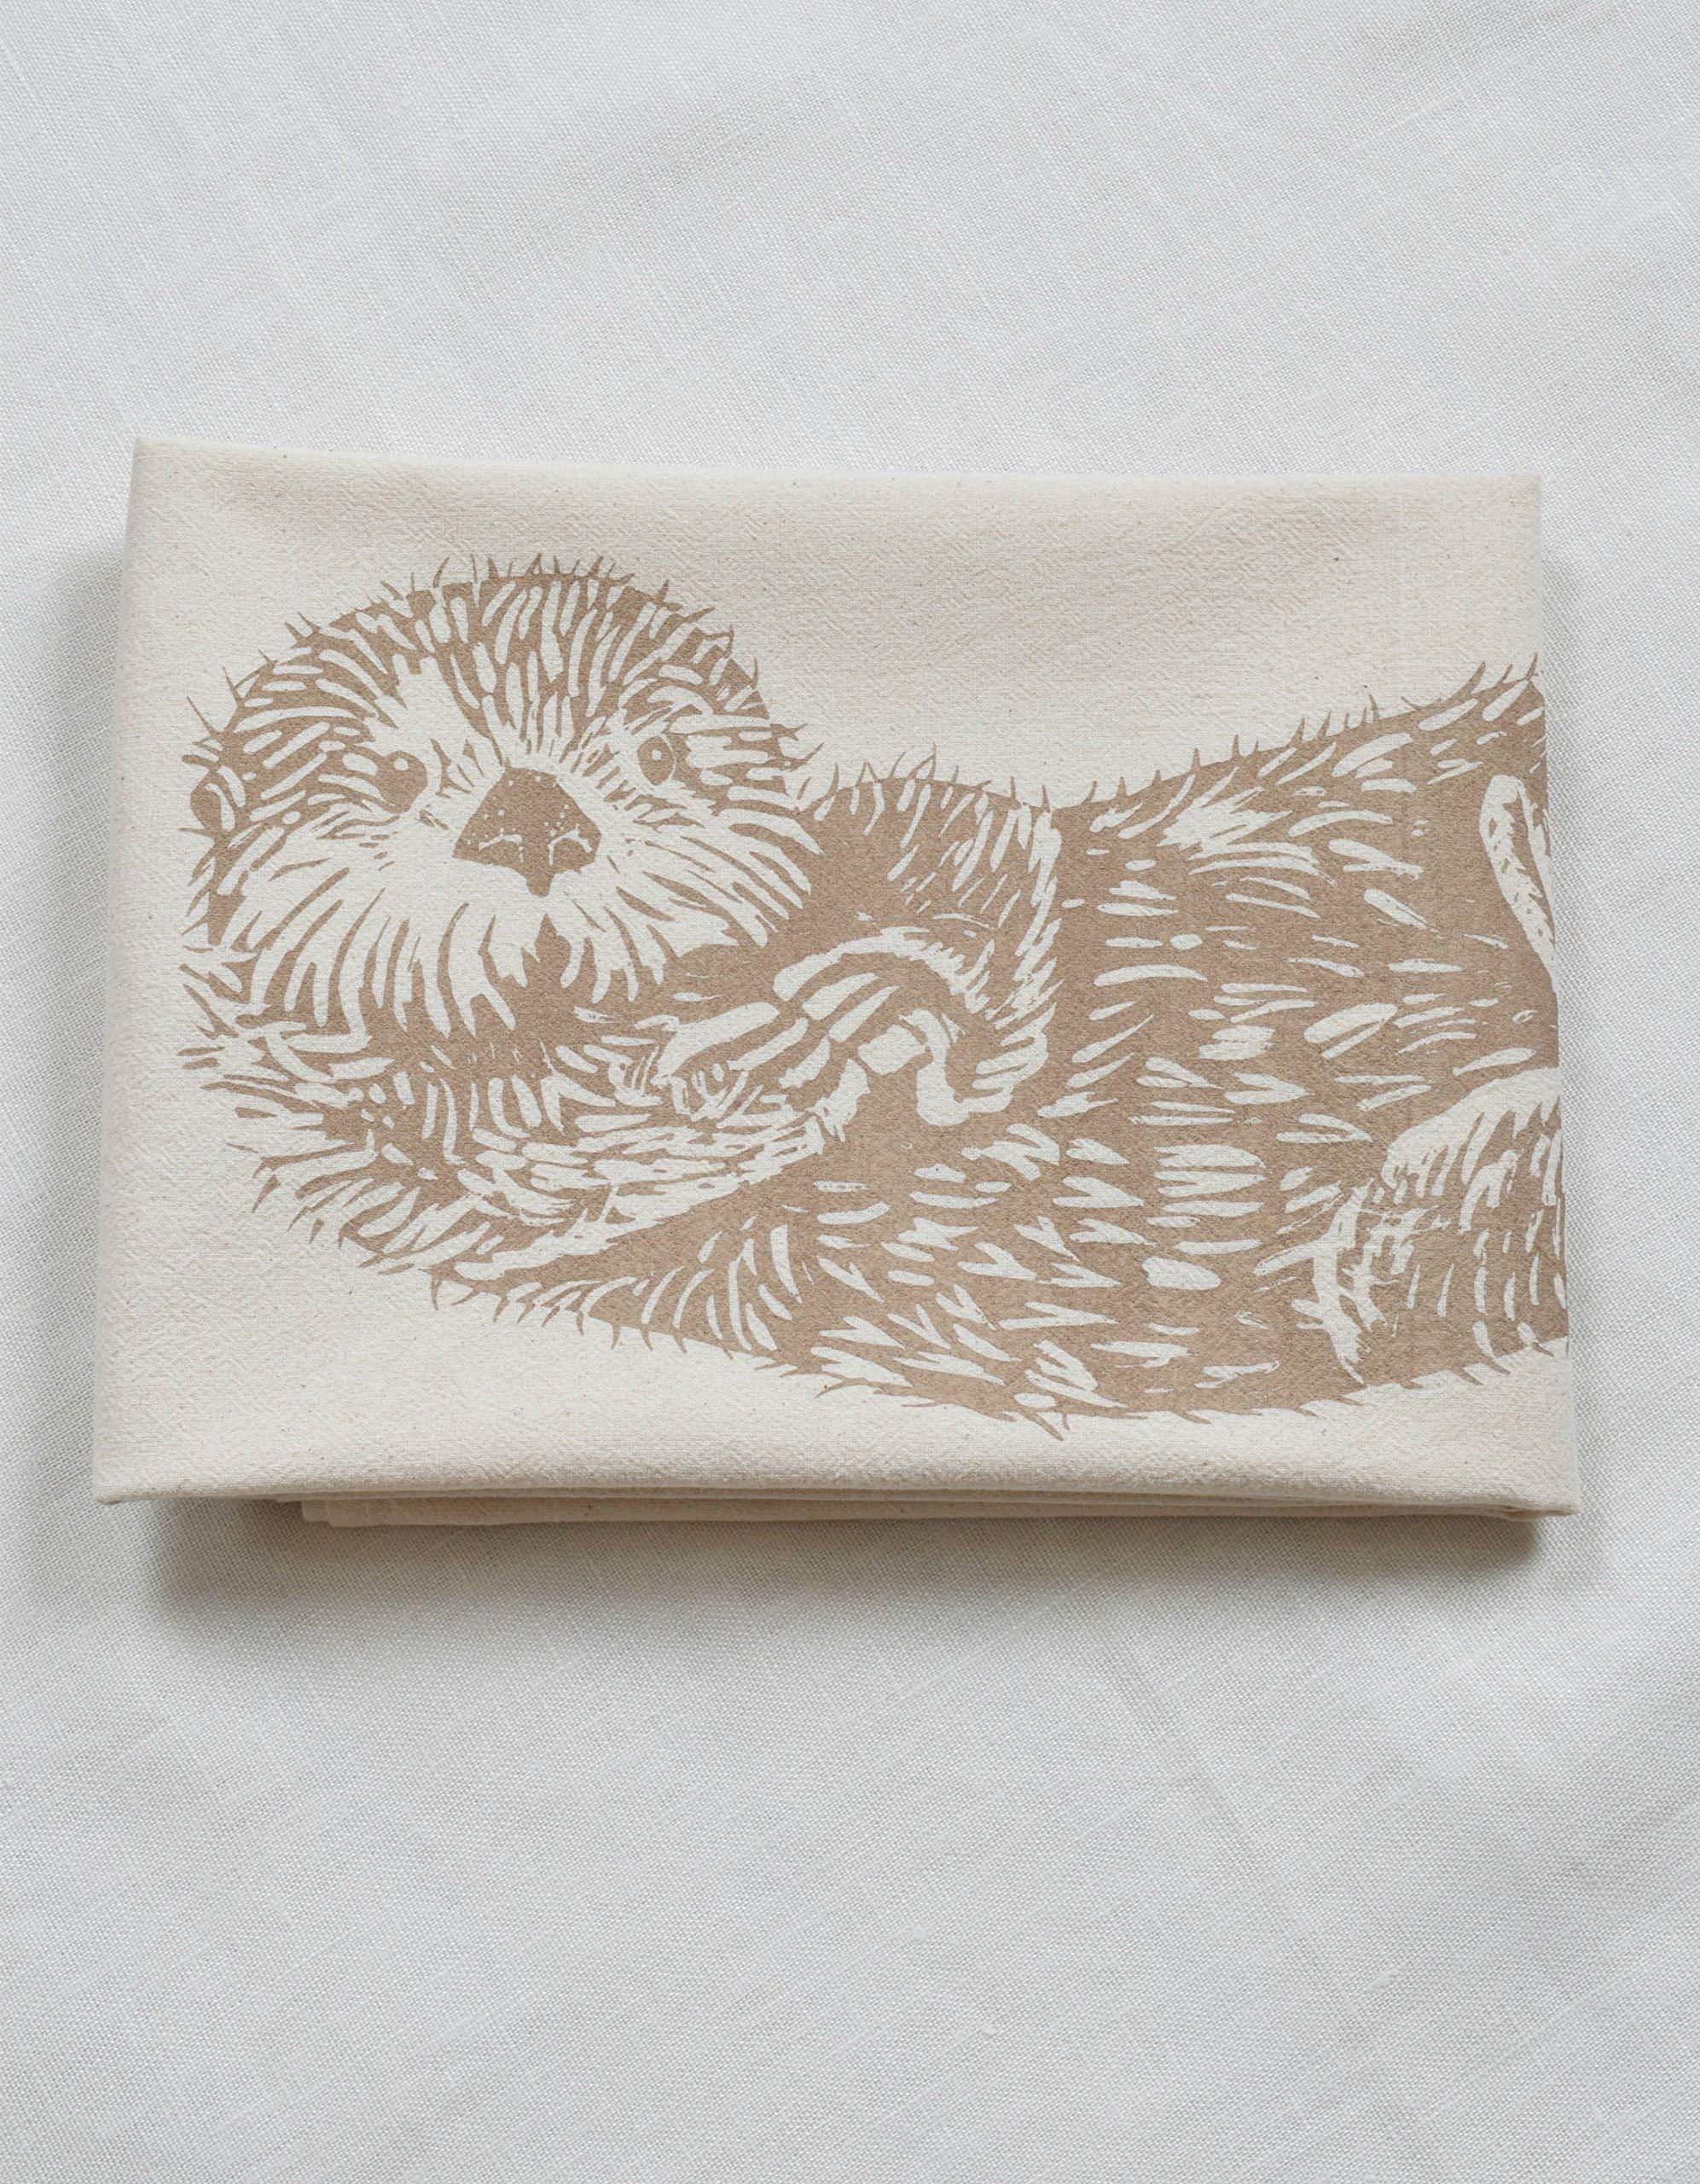 Otter Tea Towel - Organic Flour Sack Cotton - Animal Tea Towels - Cotton Dishcloth - Sea Otter Kitchen Towel